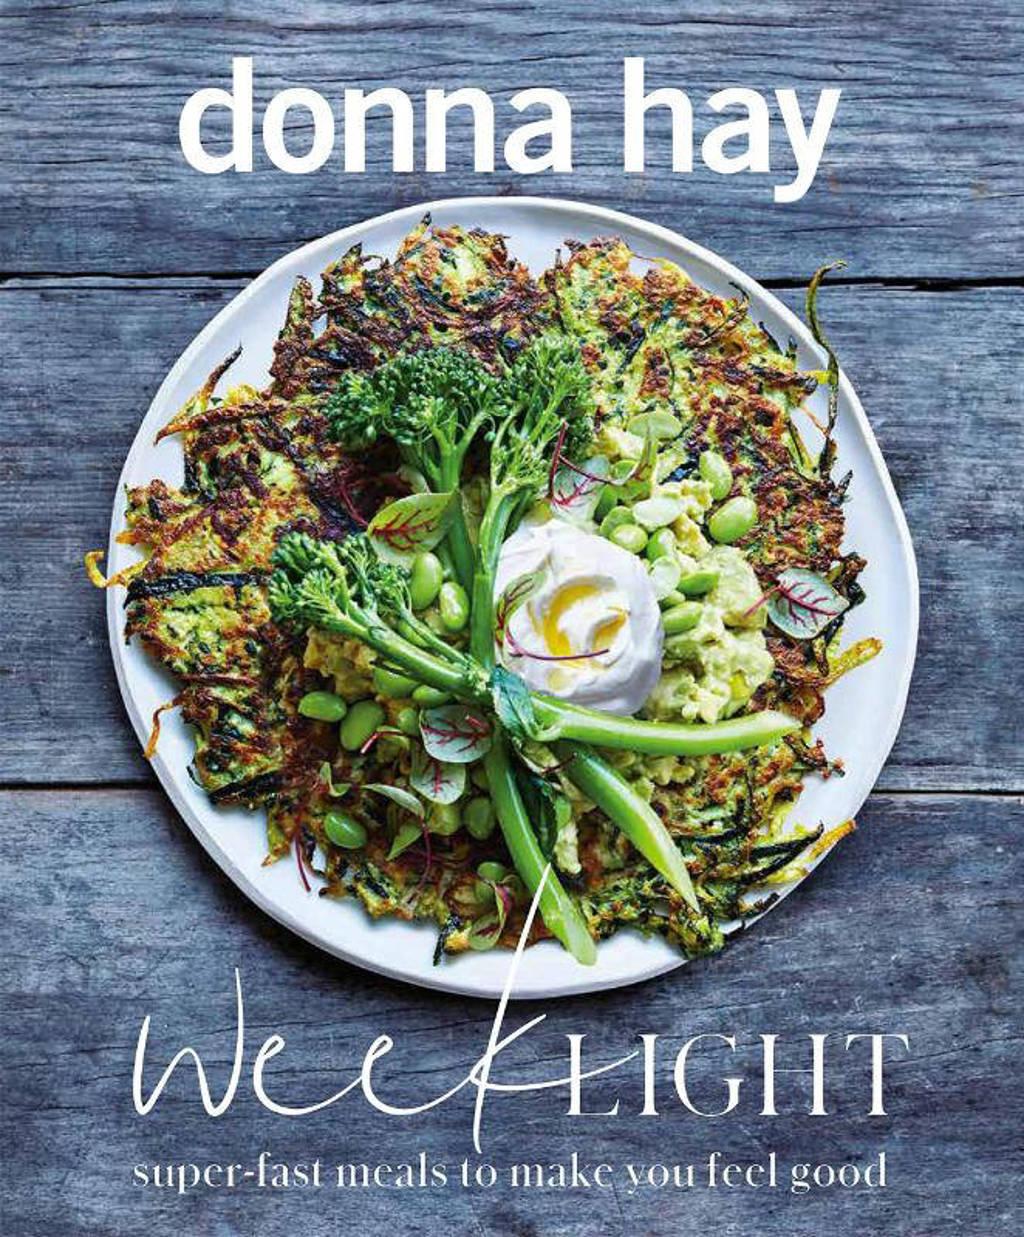 Week Light - Donna Hay